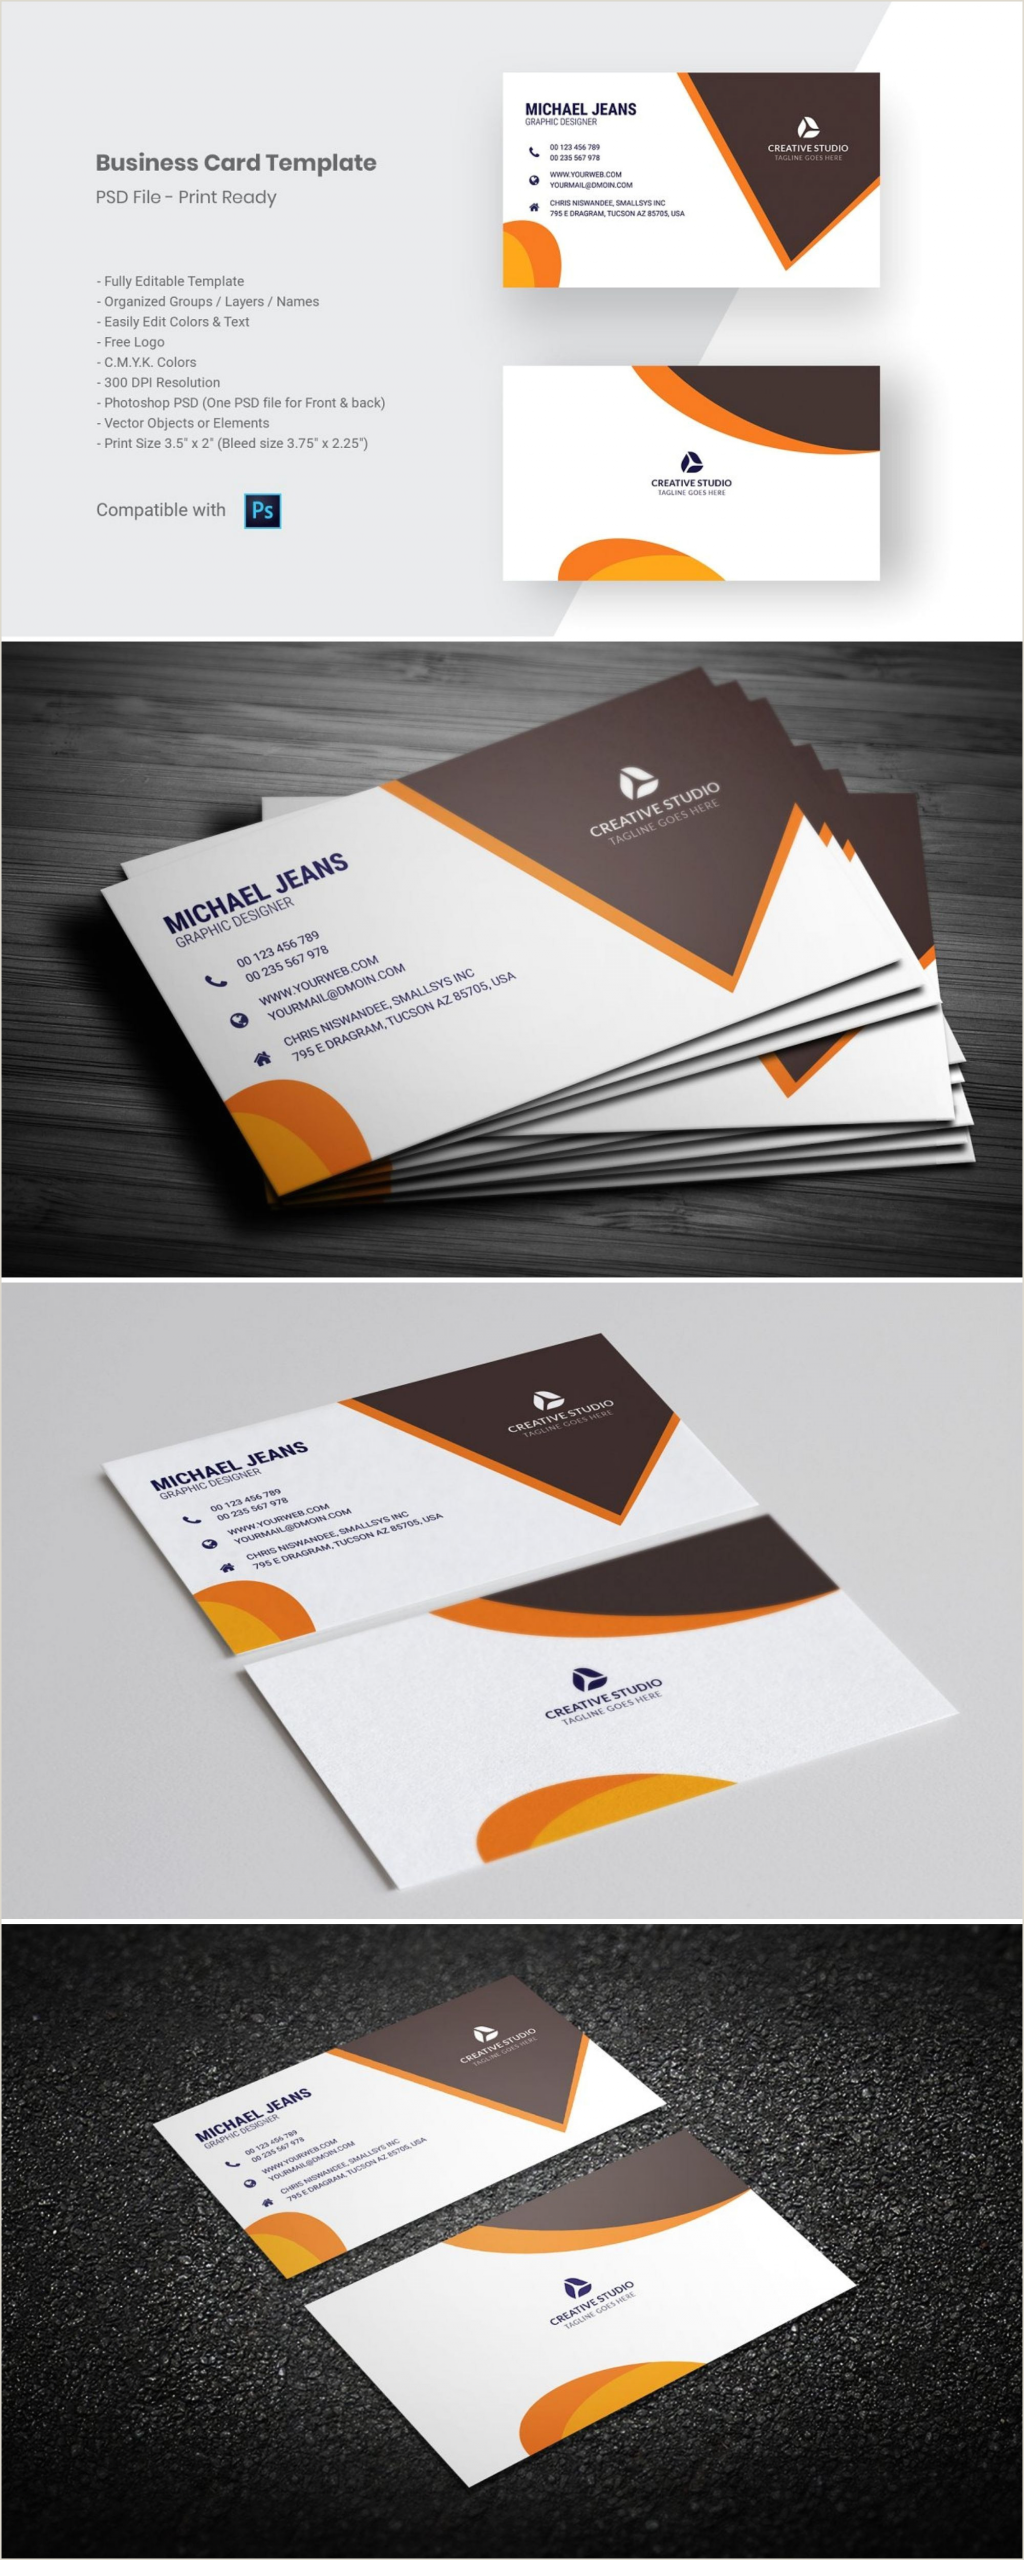 Cheap Professional Business Cards Modern Business Card Template